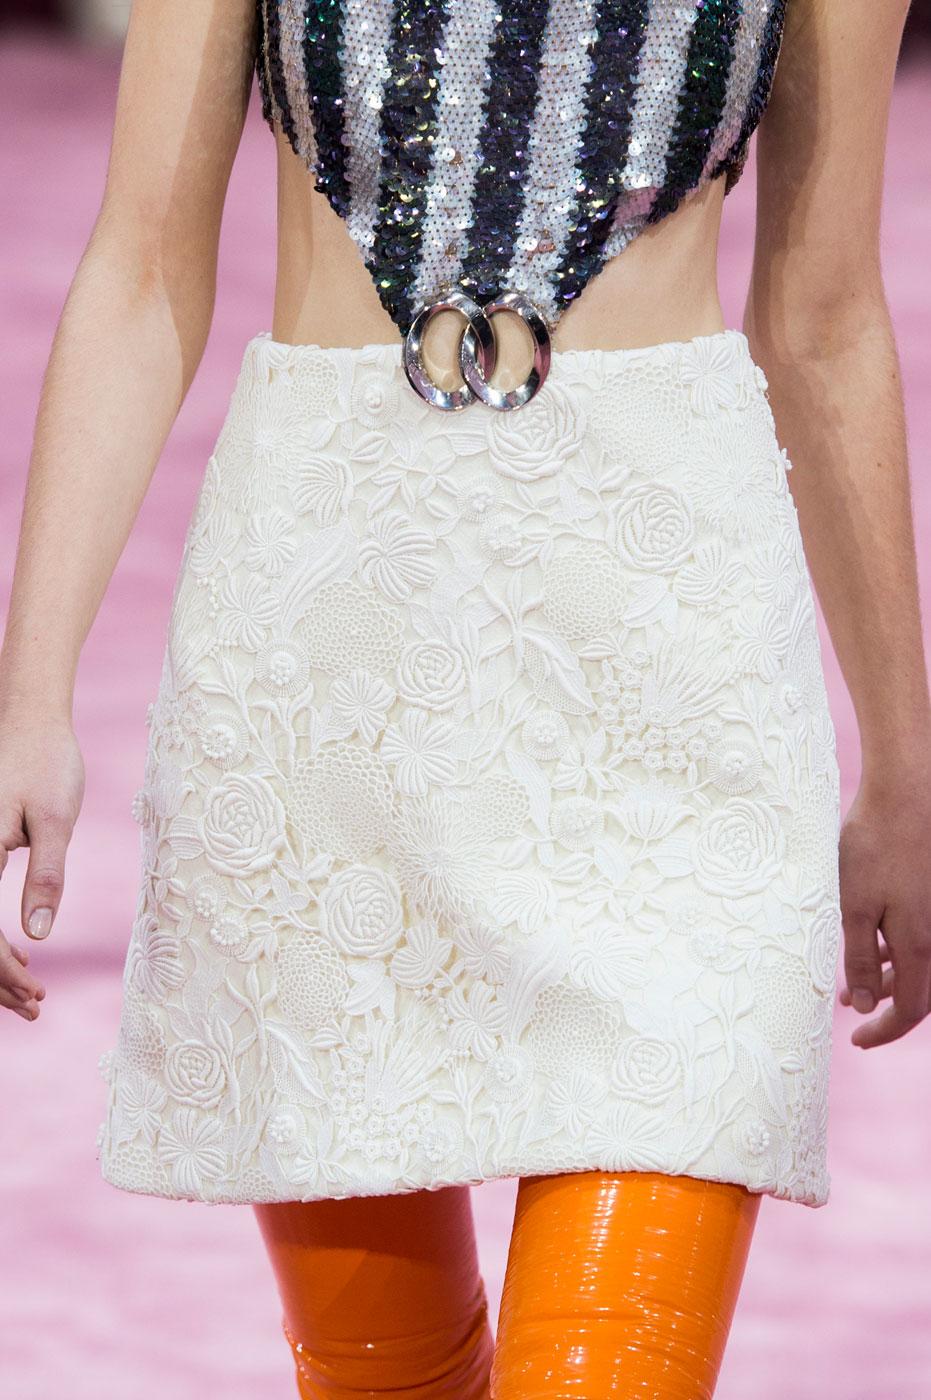 Christian-Dior-fashion-runway-show-close-ups-haute-couture-paris-spring-summer-2015-the-impression-193